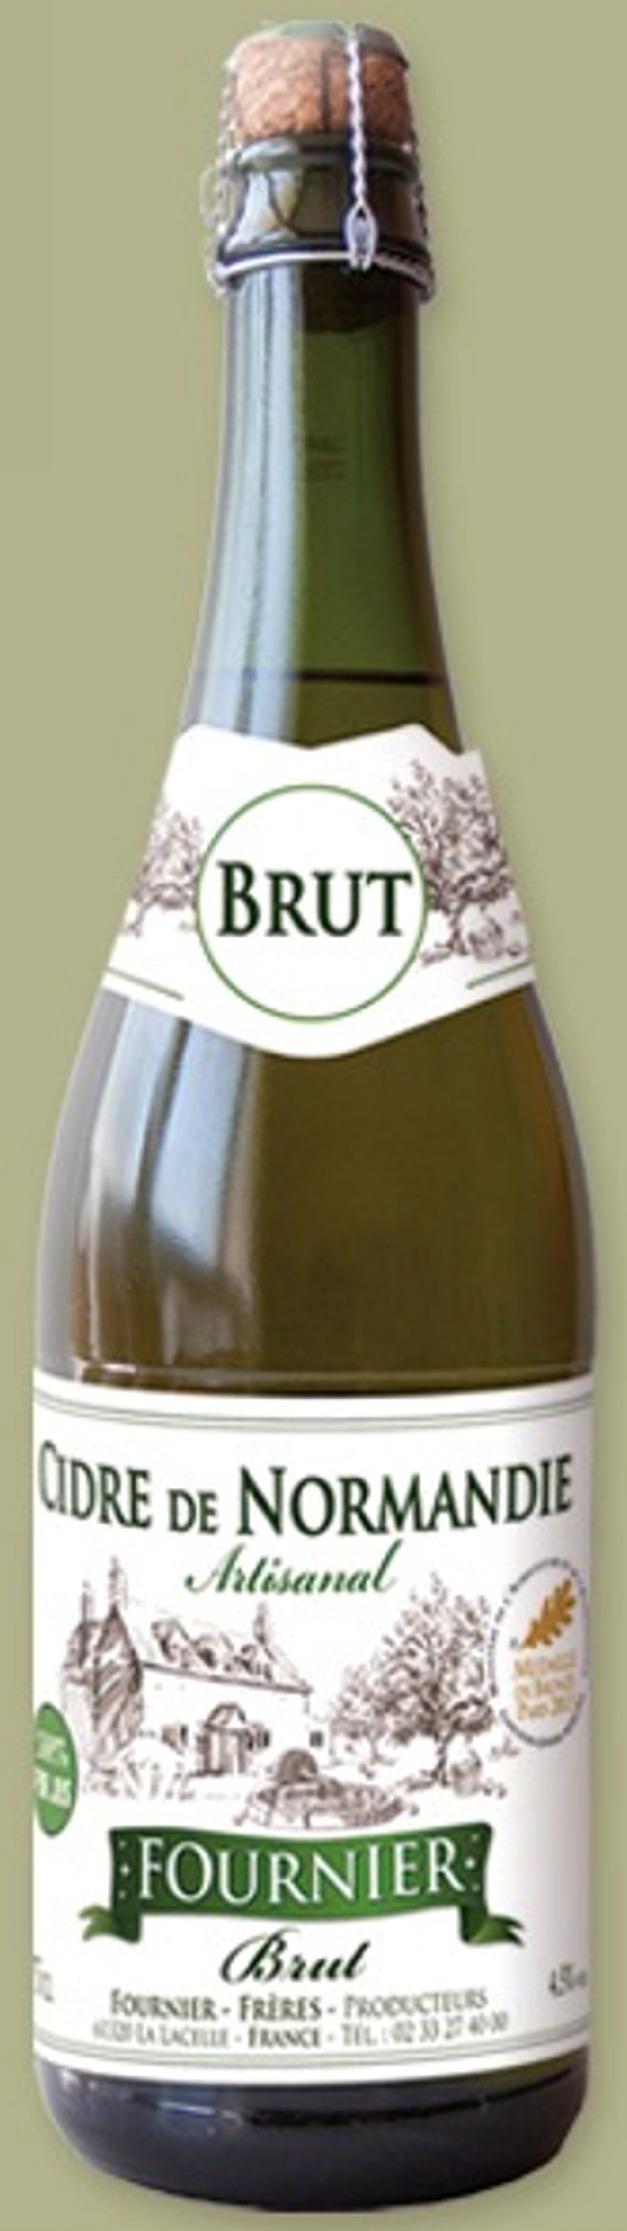 Morin Fournier Cidre De Normandie Timeless Wines Order Wine Strawberry Cider Bottle